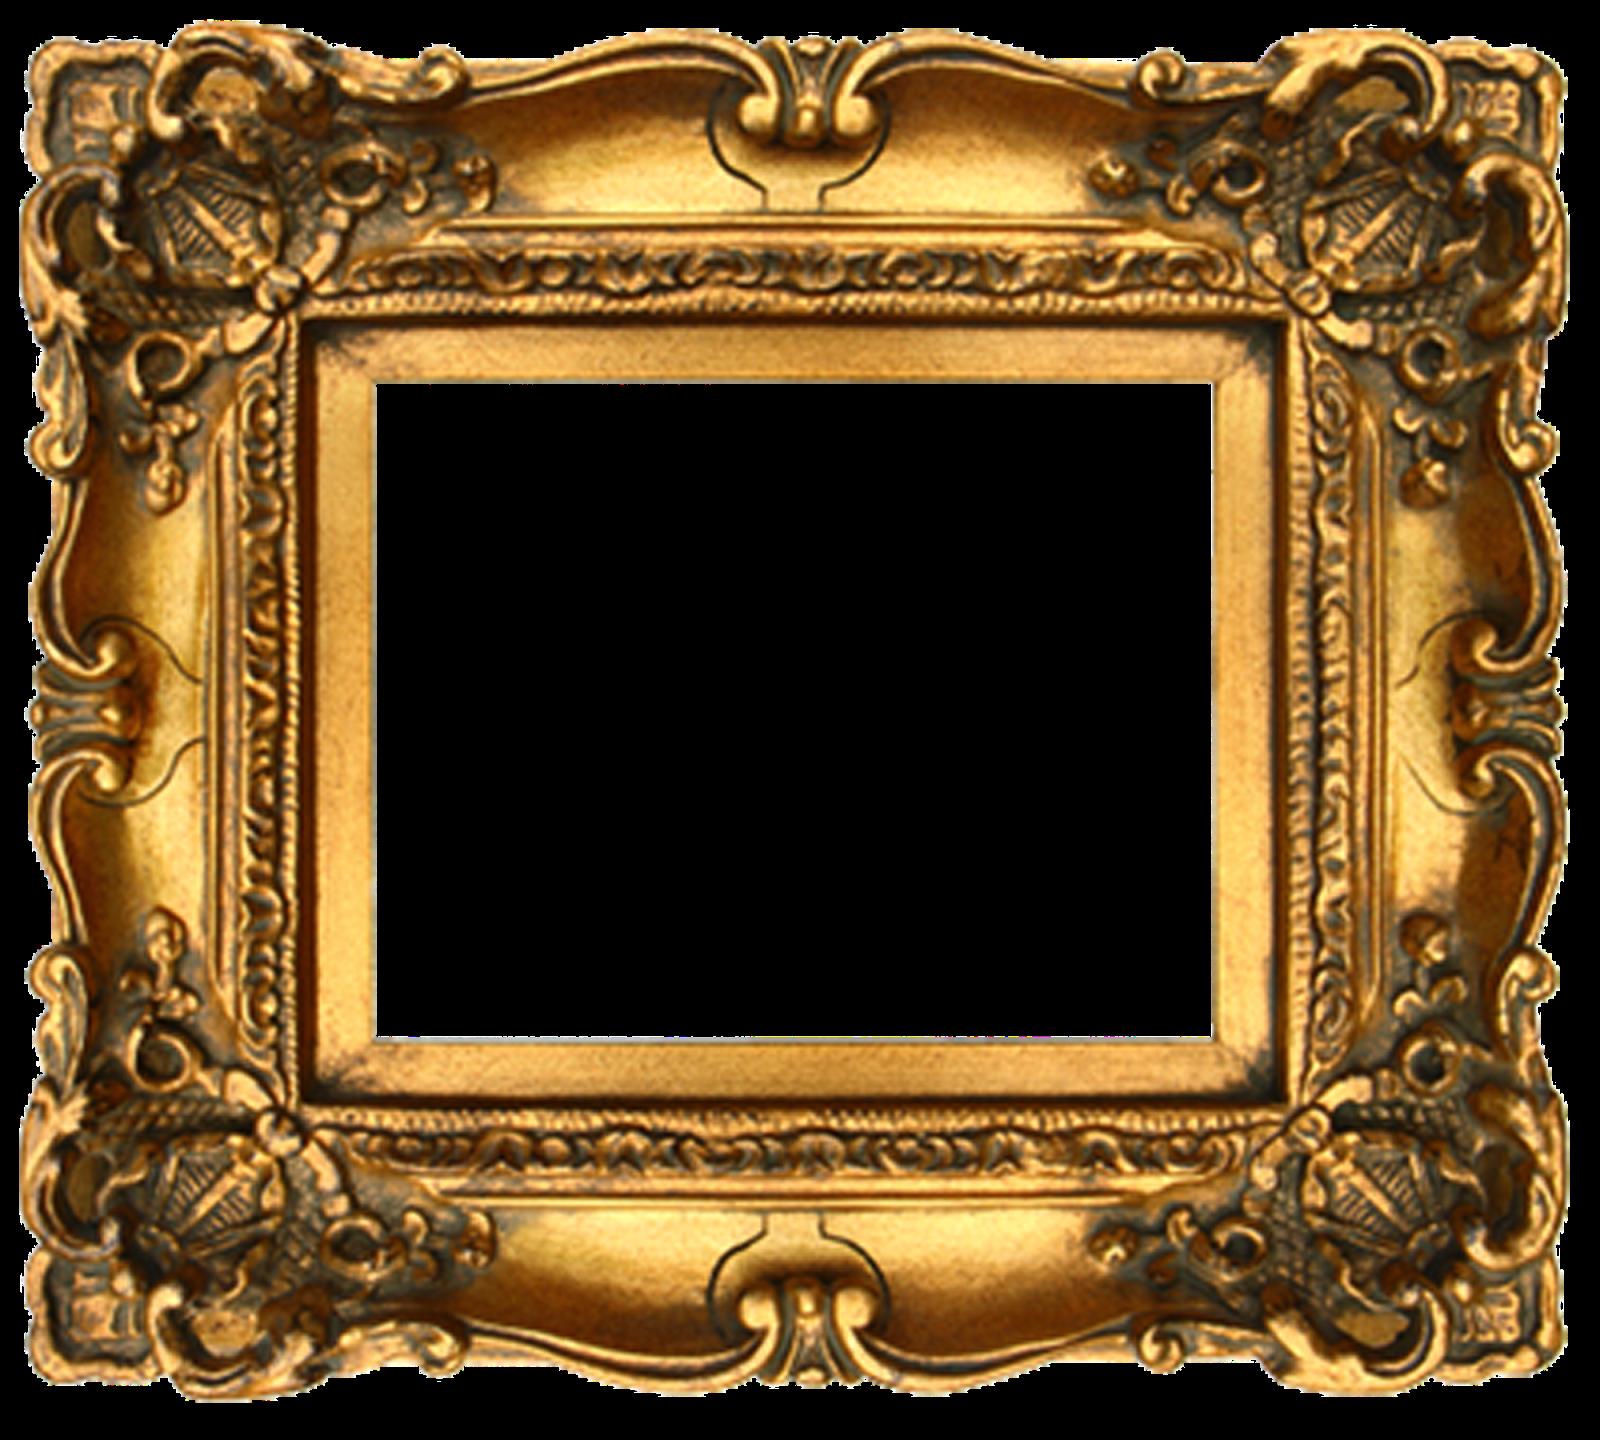 Vintage Gold Gilded Frames Free Printables Picture Frame Template Antique Picture Frames Gold Picture Frames